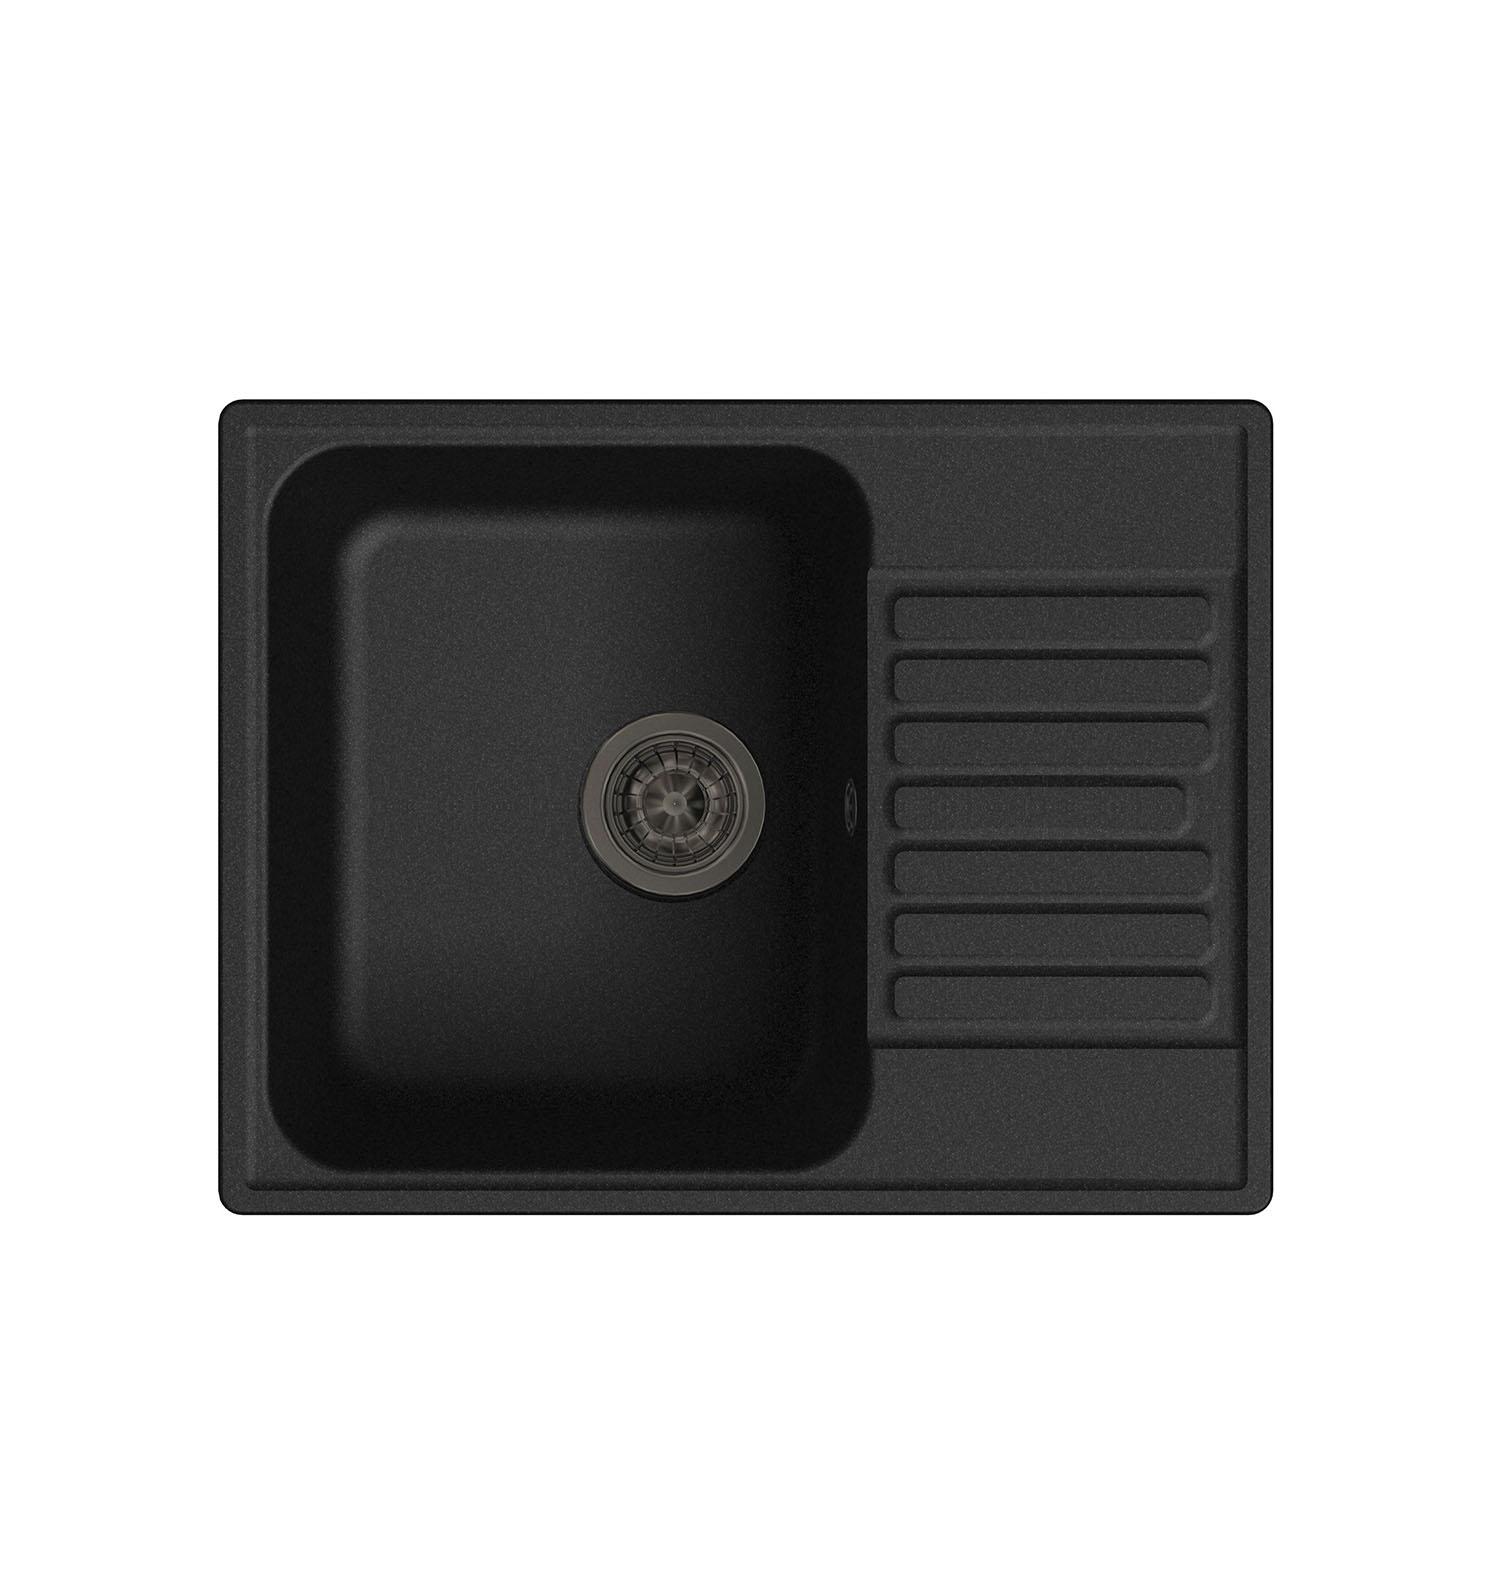 LEX Garda 620 Black кухонная мойка lex garda 620 black черный